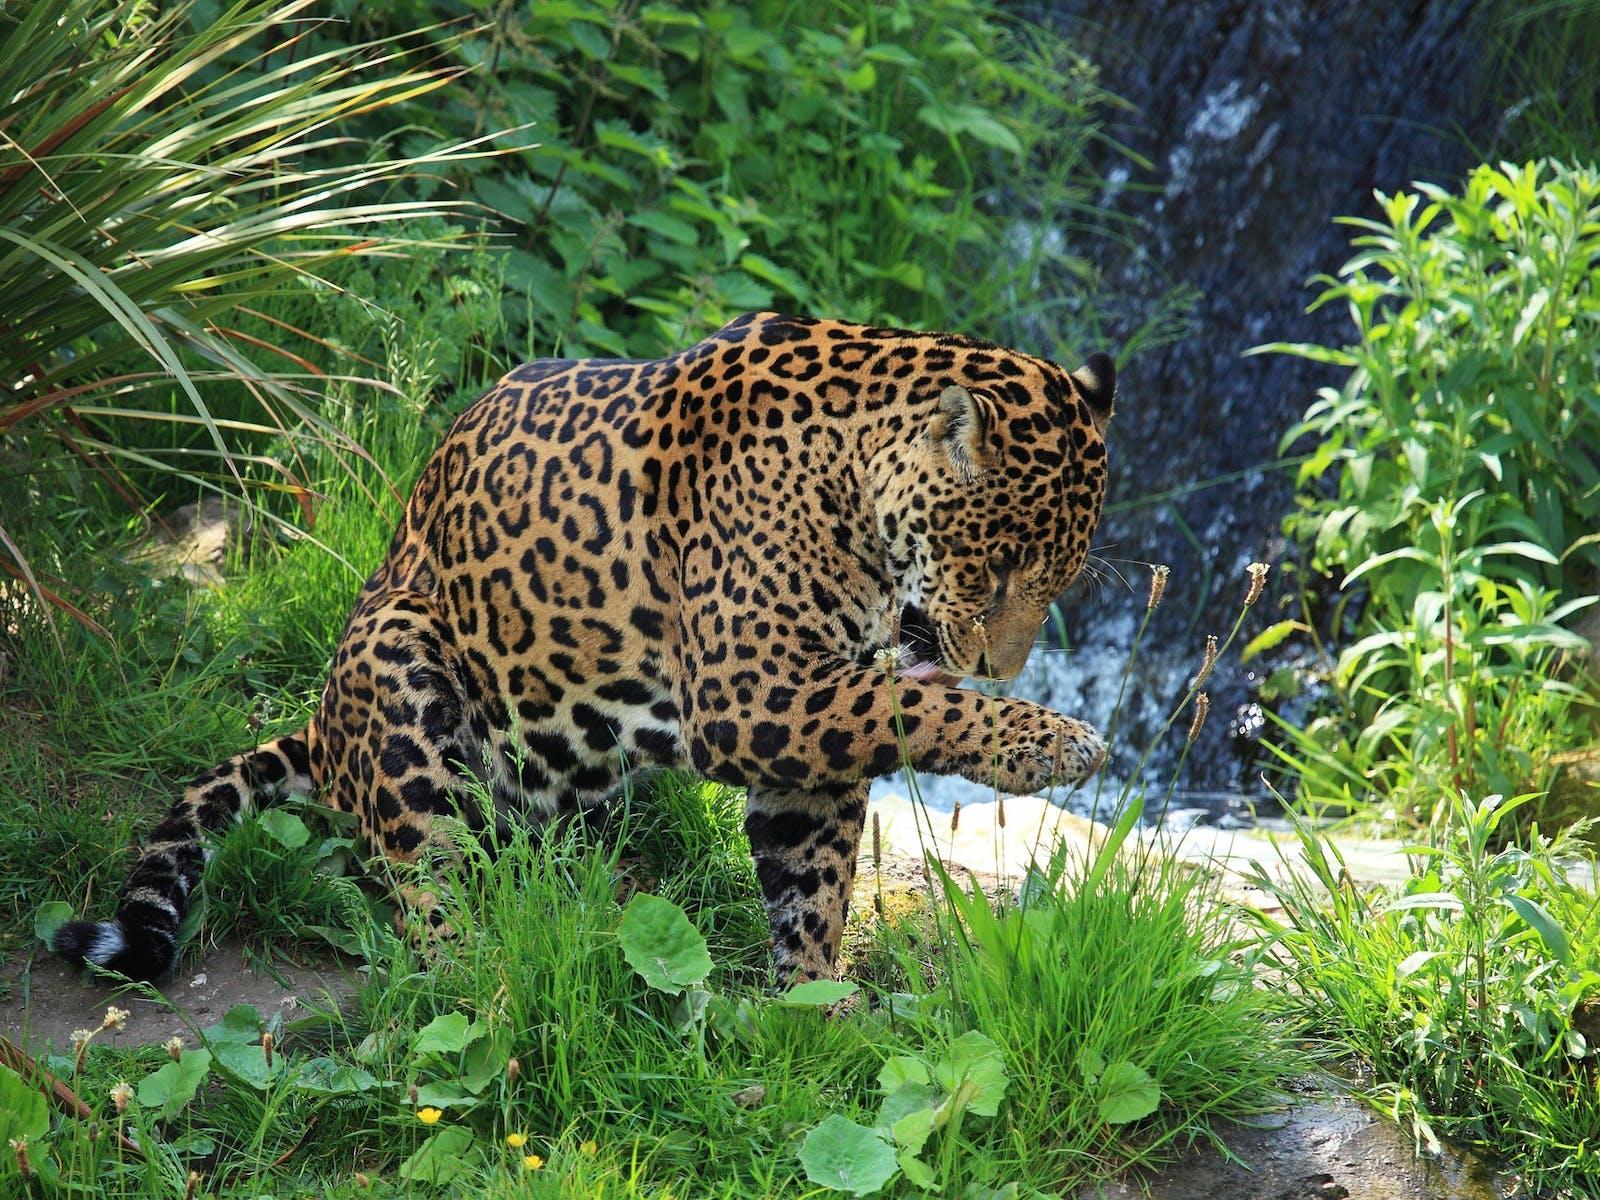 jaguar cleaning itself